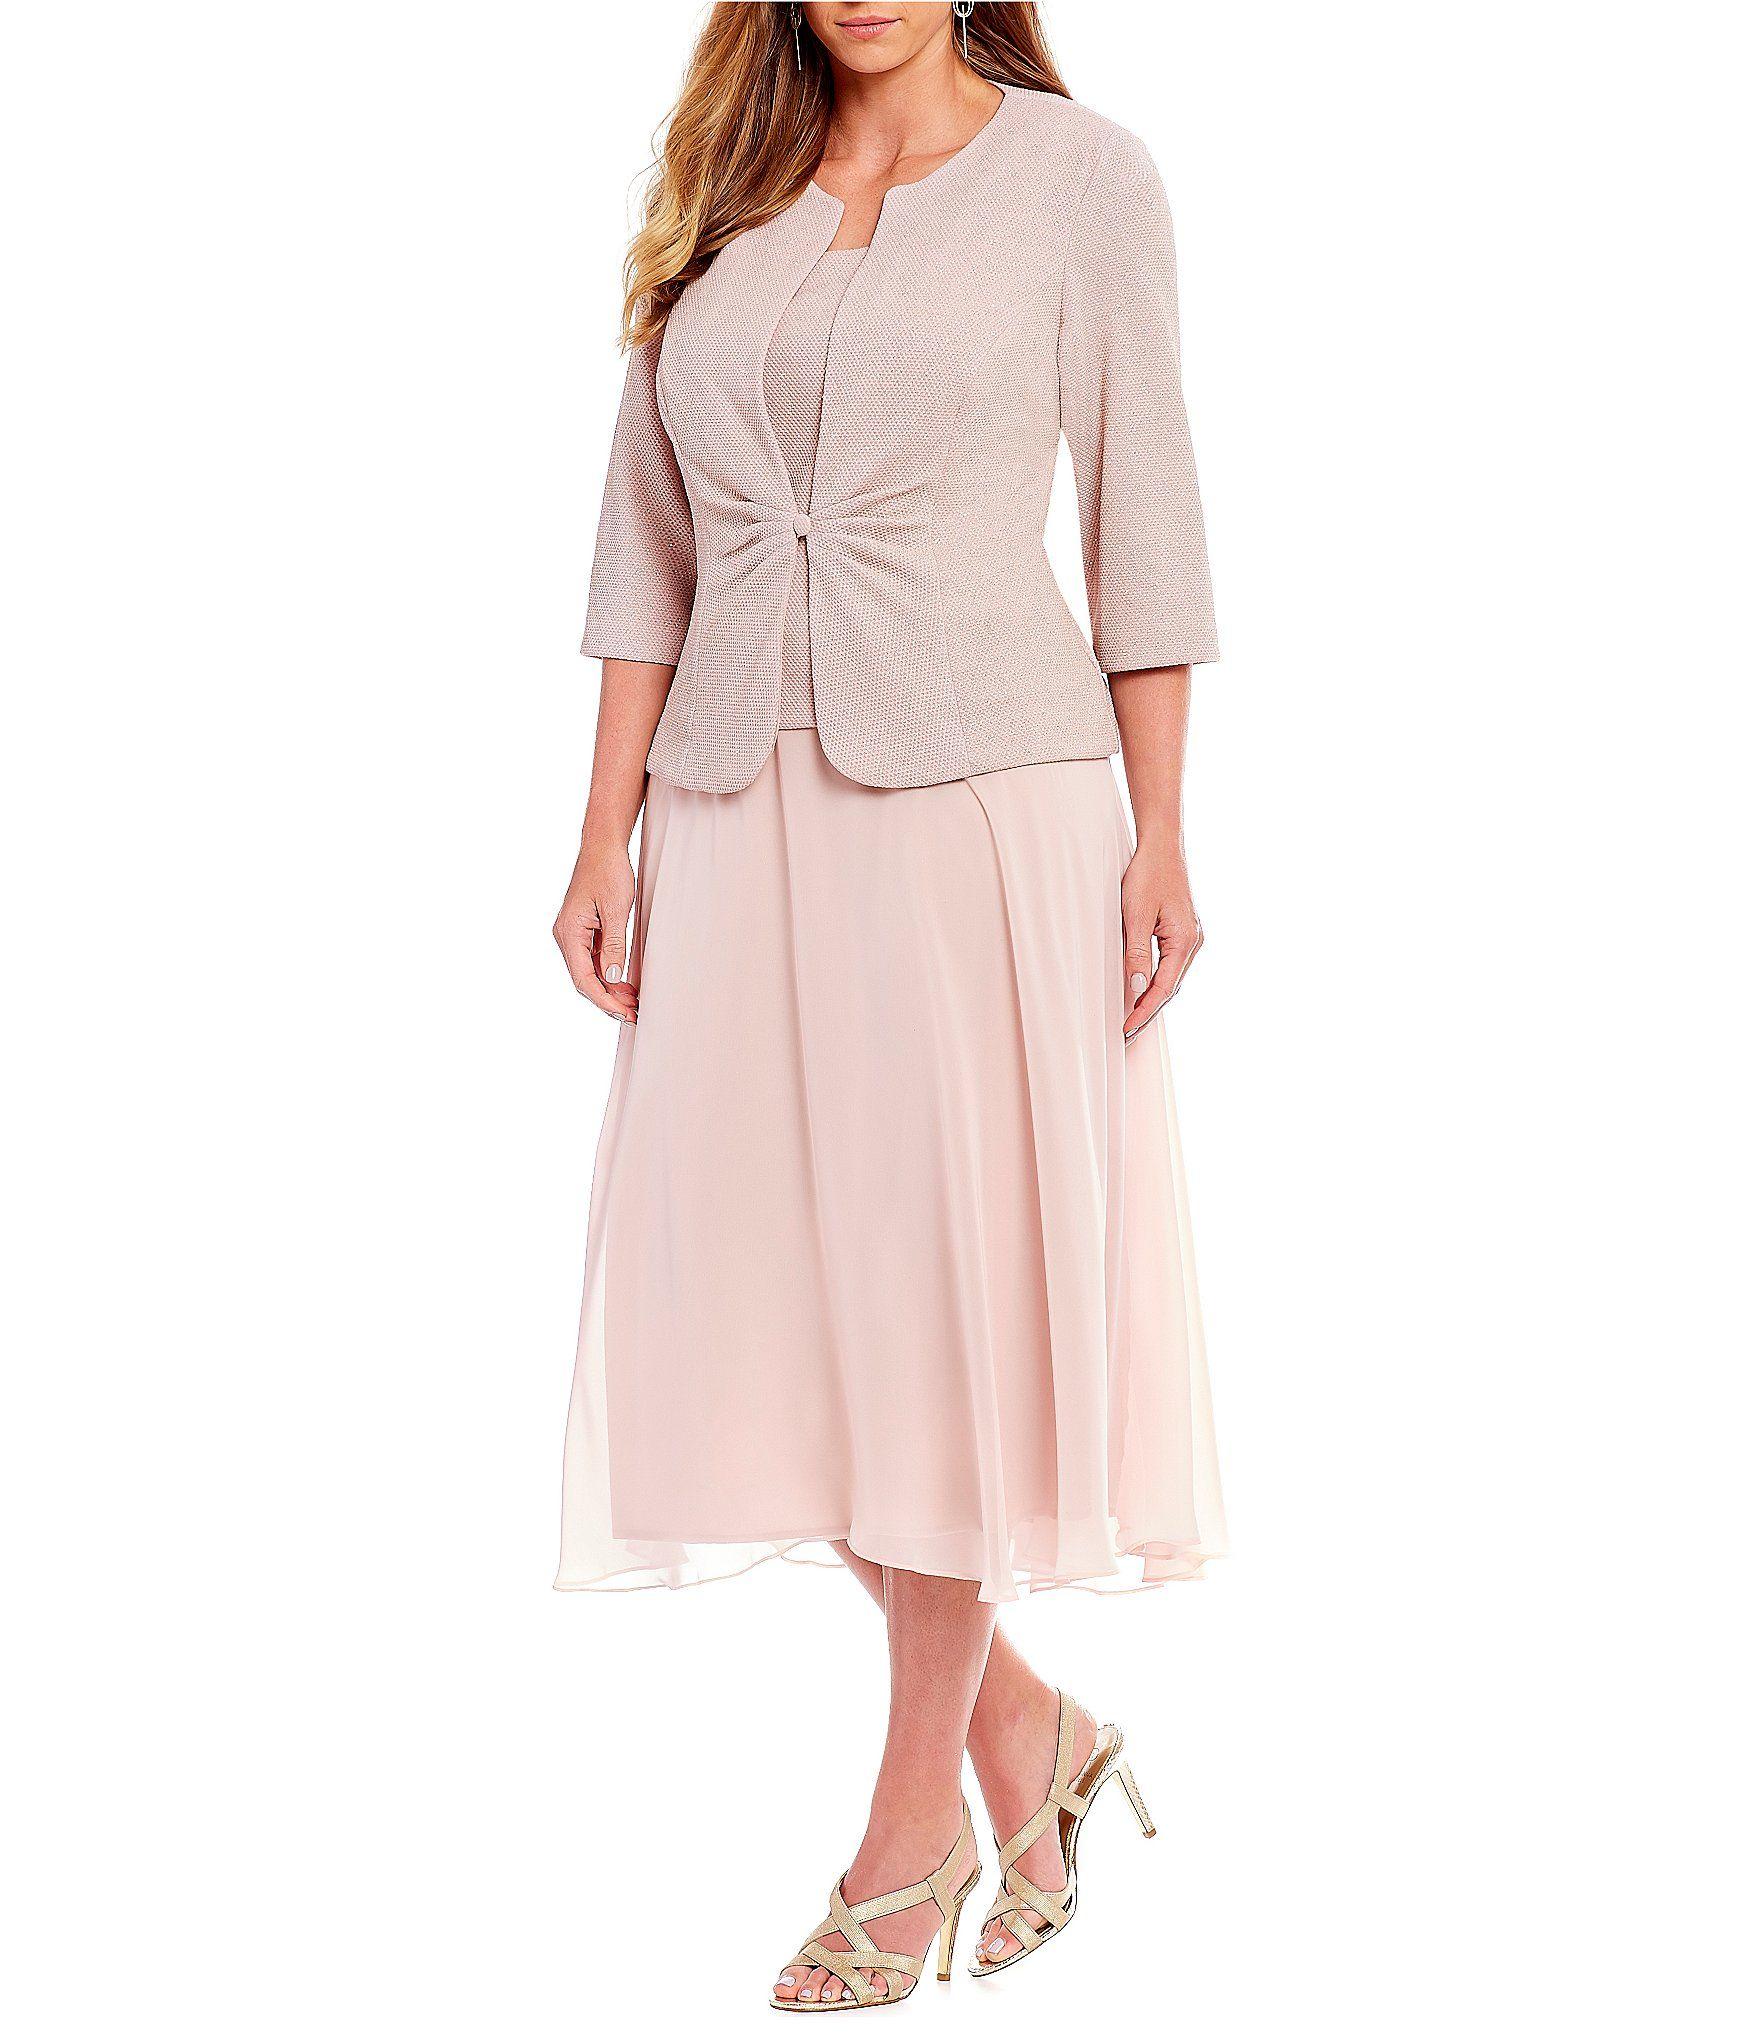 ae19c7f6306 Alex Evenings Plus Size Midi Length Mock Jacket Dress  Dillards ...